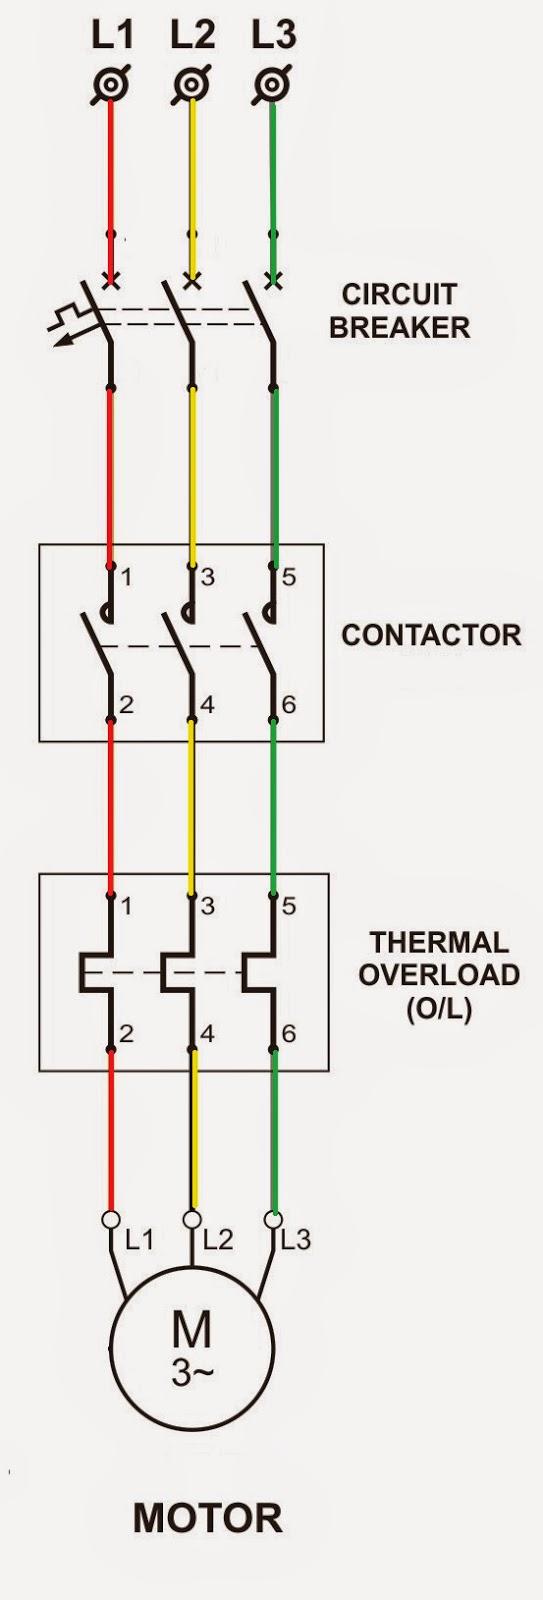 Power+Ciruit?resize=543%2C1600 dol starter wiring diagram for single phase motor the best mem dol starter wiring diagram at panicattacktreatment.co